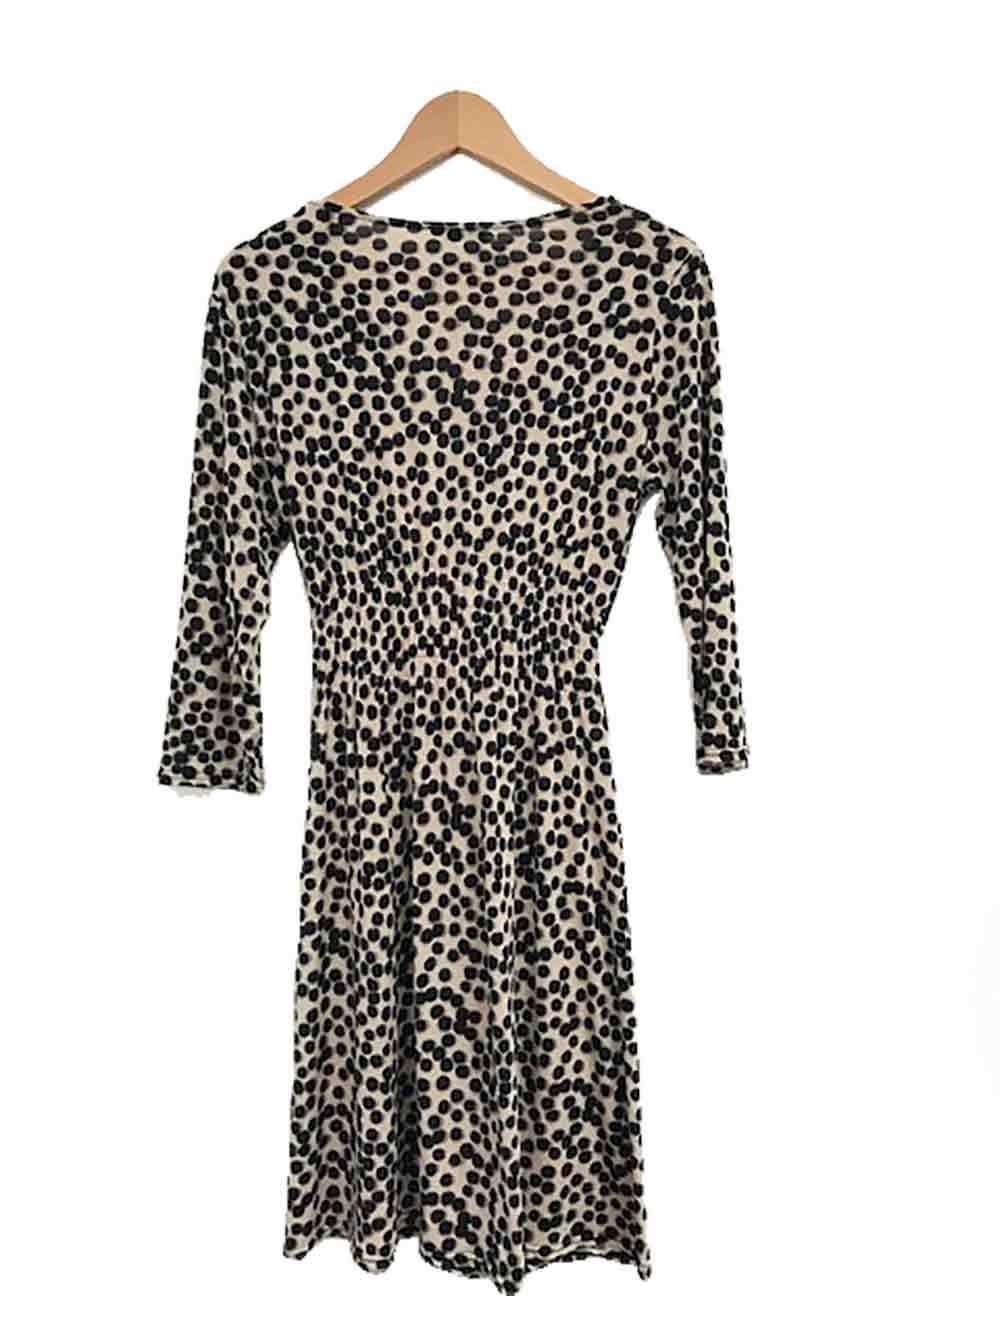 Designer Egerie Paris VTG Size 10 to to to 12 AU Animal Print Perfect Women's Dress 05c458